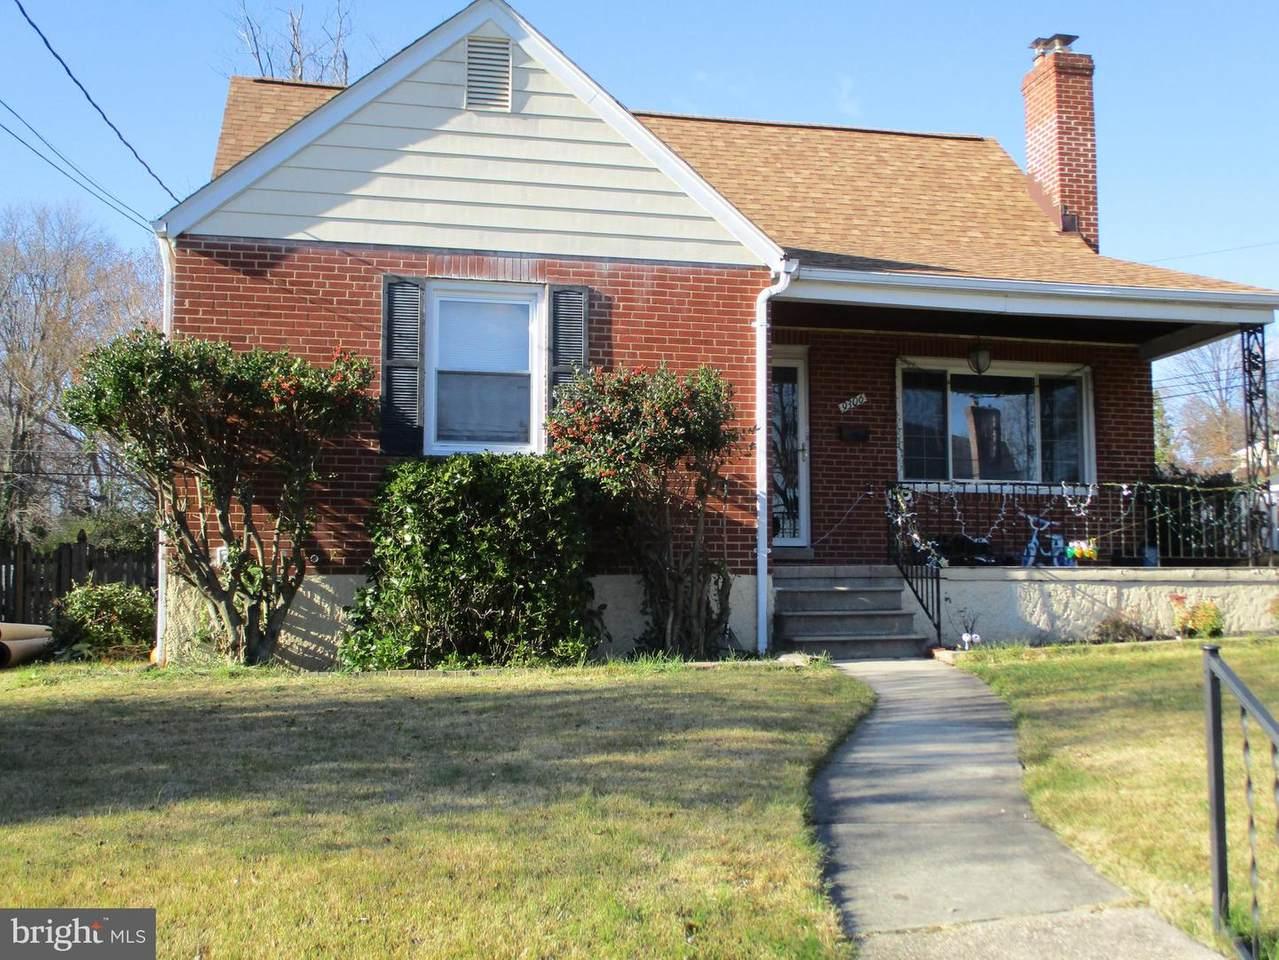 9306 Fullerdale Avenue - Photo 1